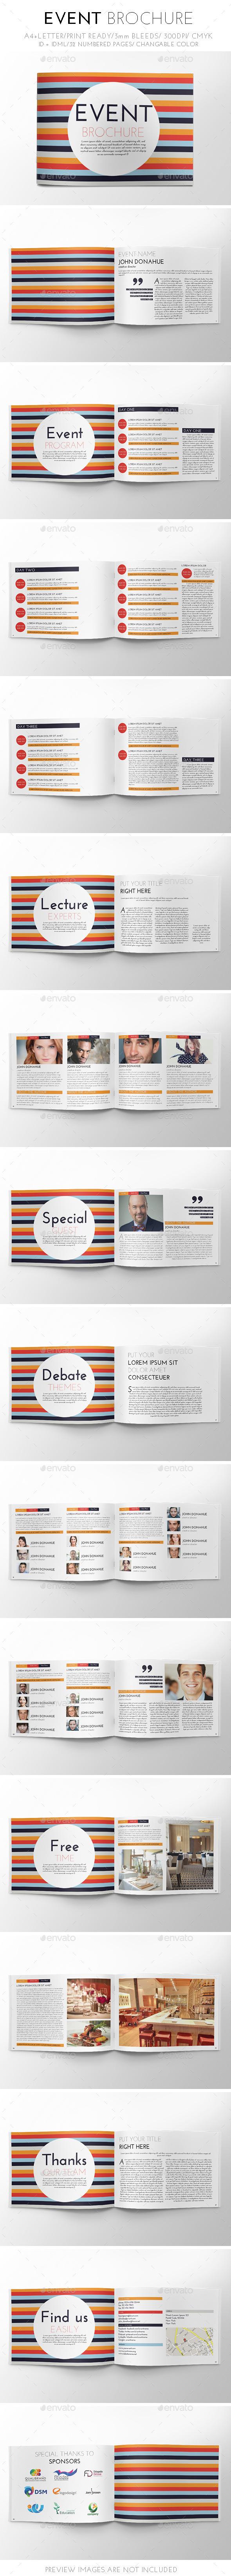 GraphicRiver Event Brochure Template 9542887